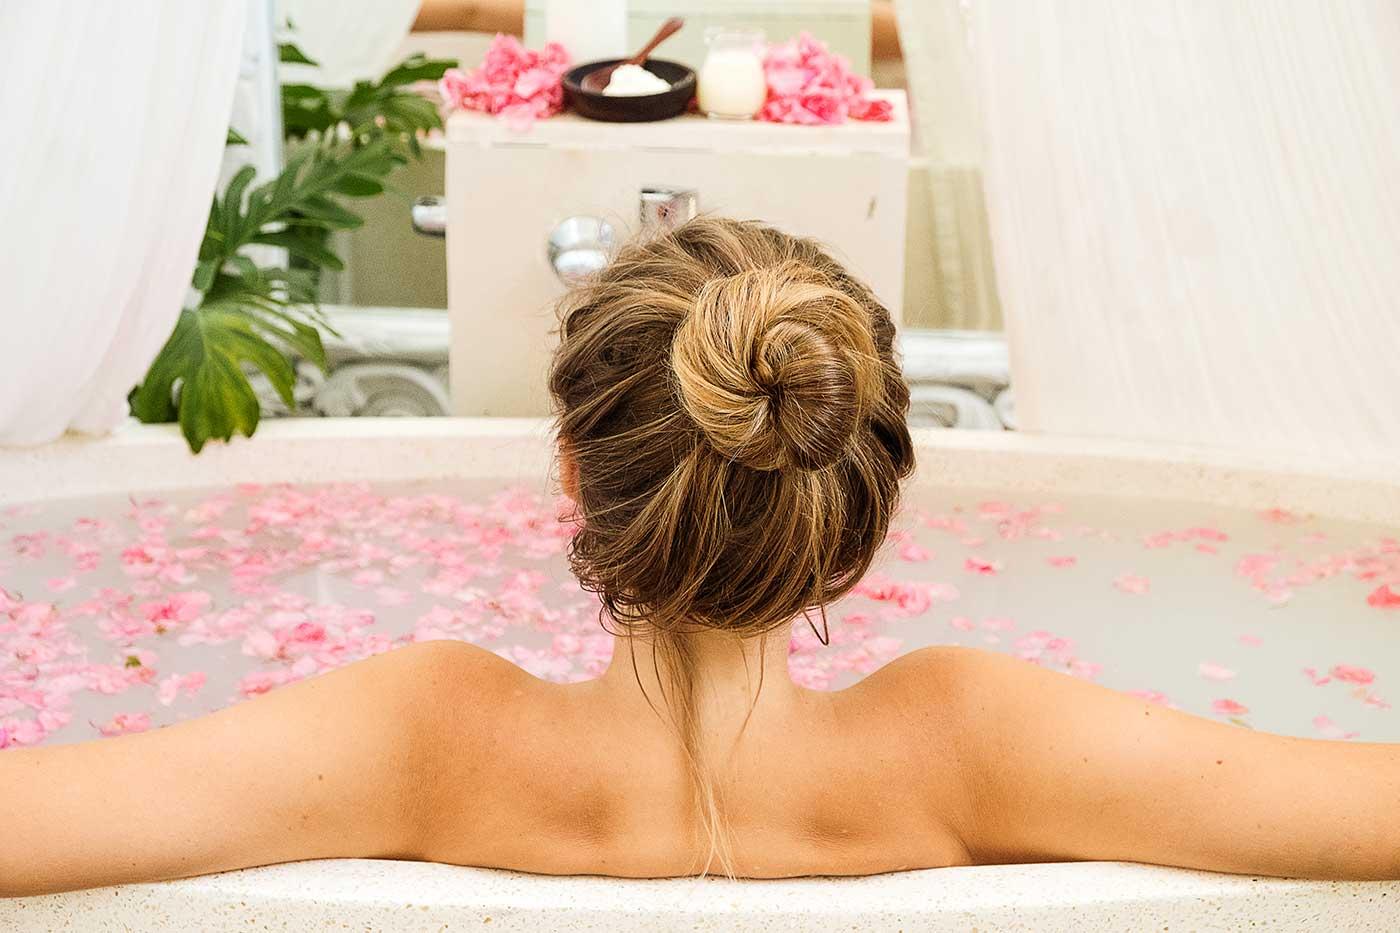 Woman relaxing in flower bath at Bali wellness retreat